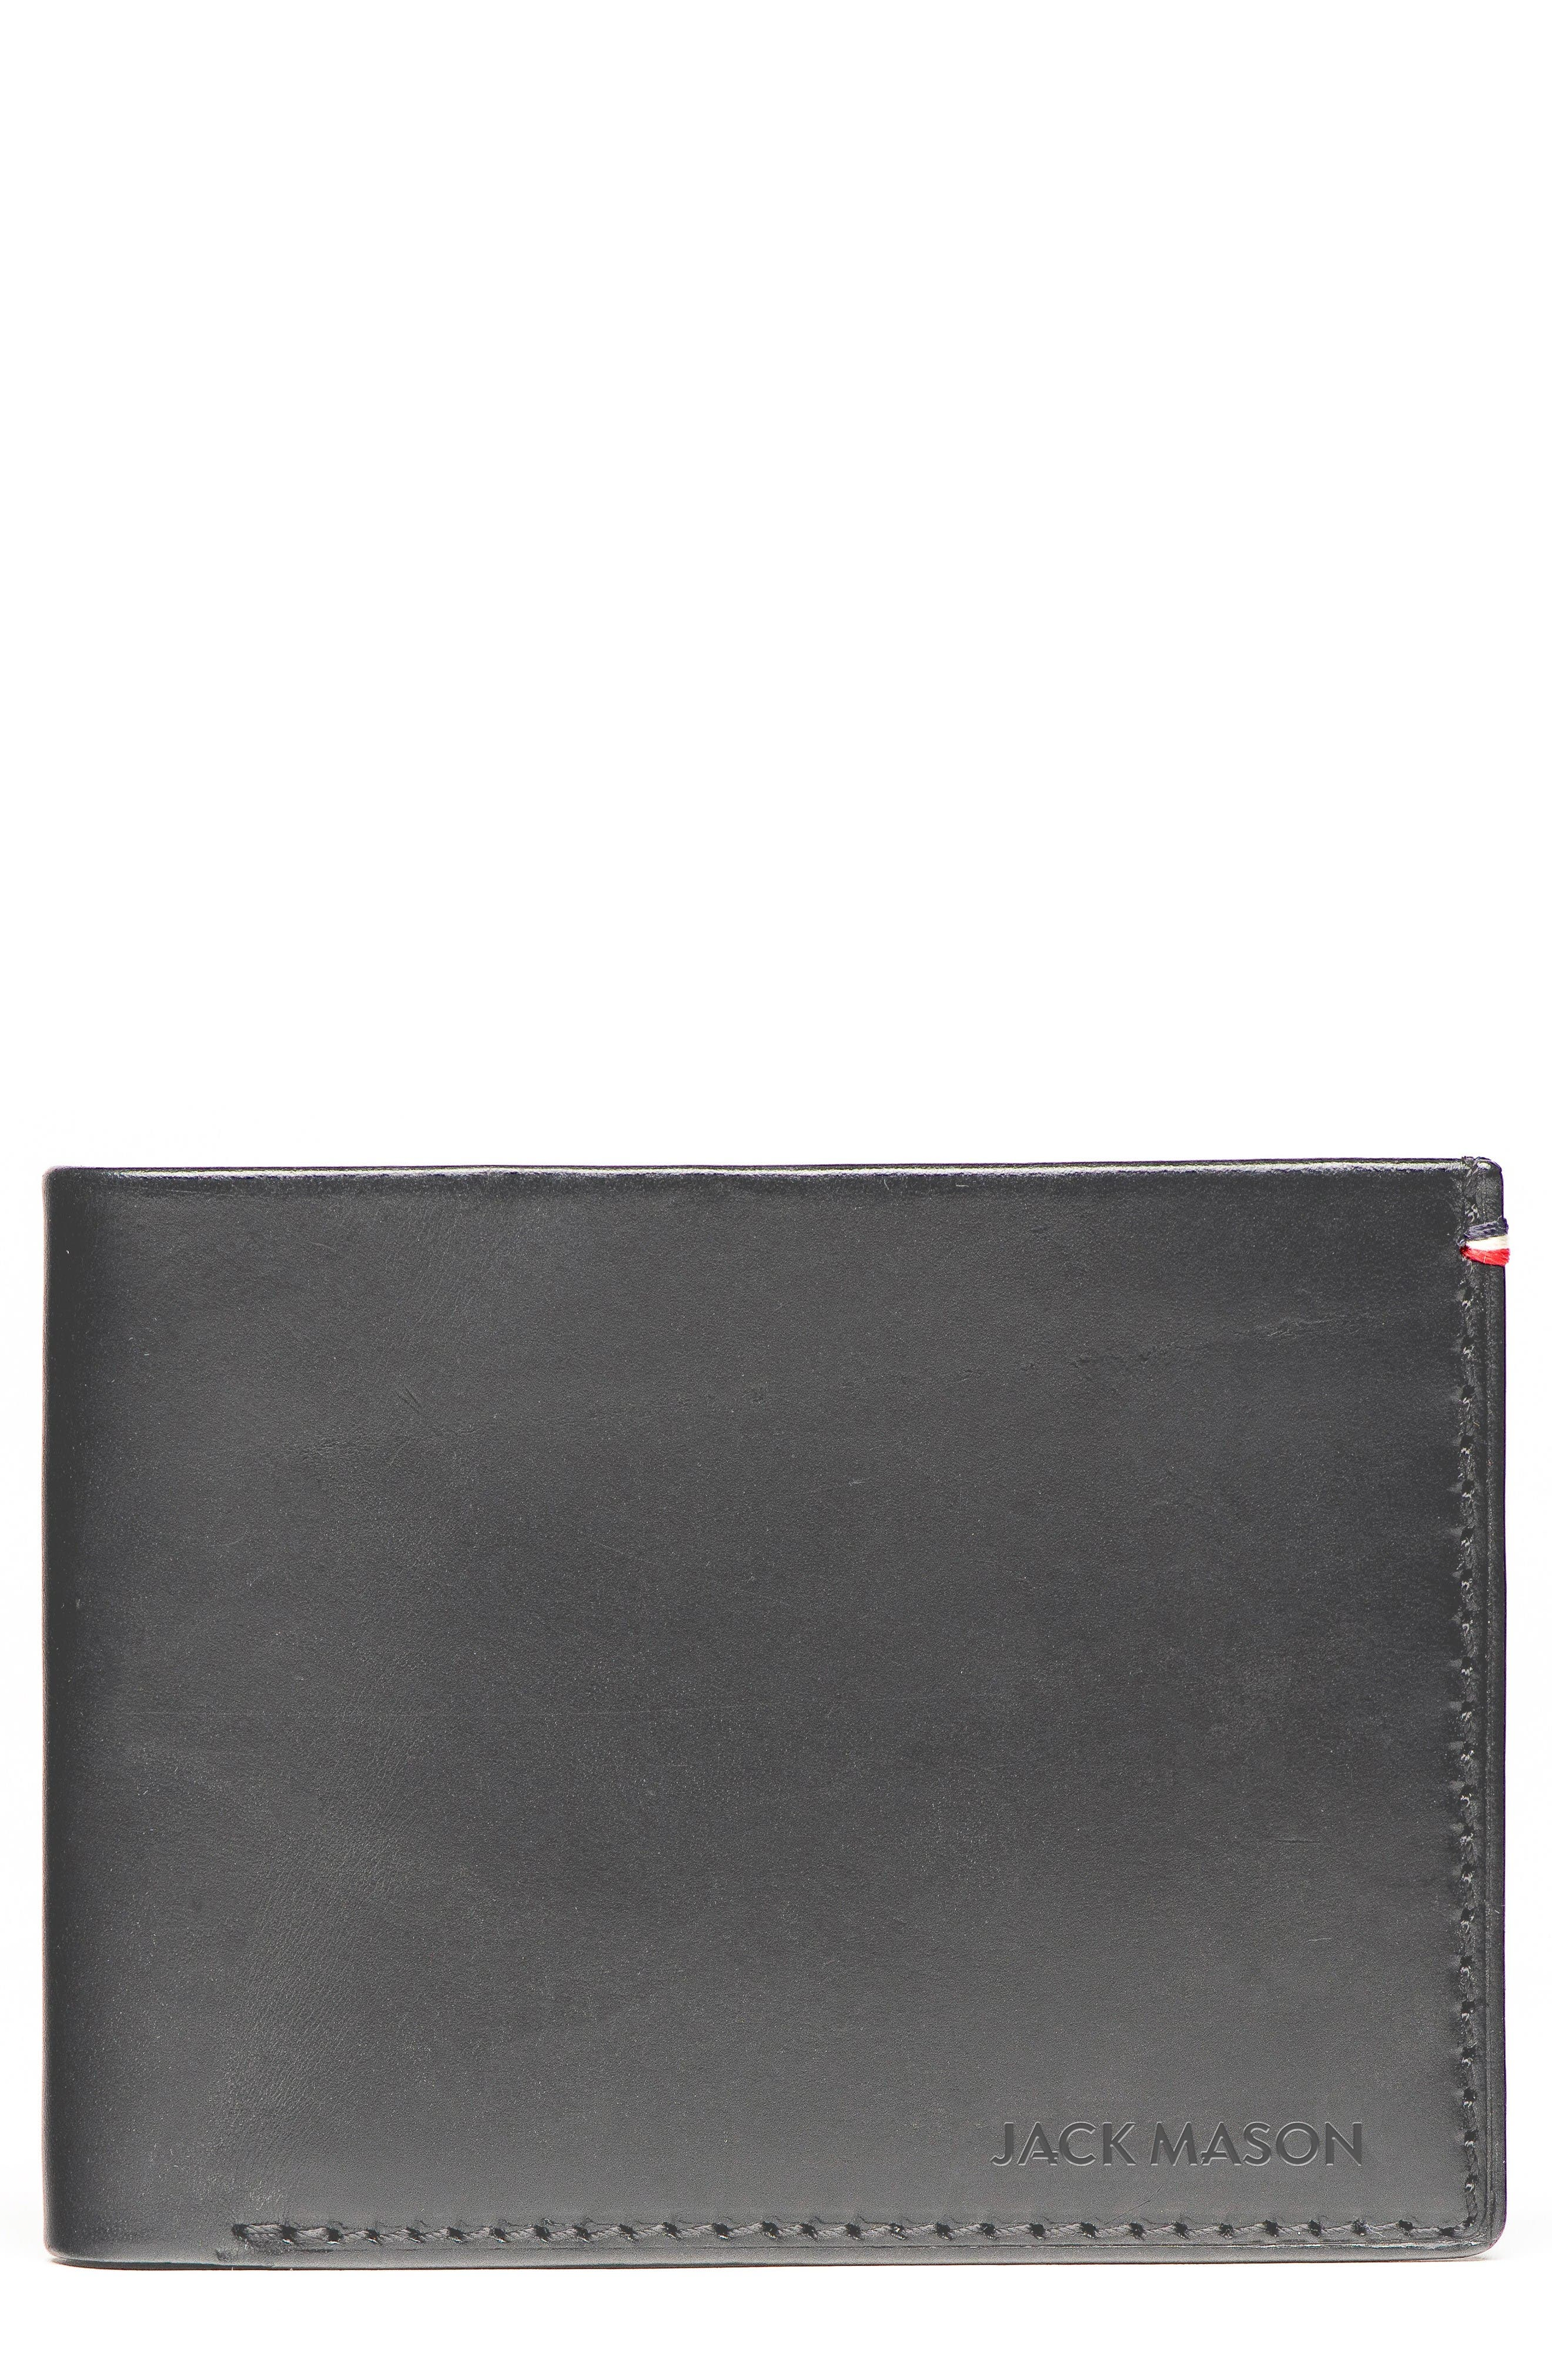 JACK MASON Lux Leather Wallet